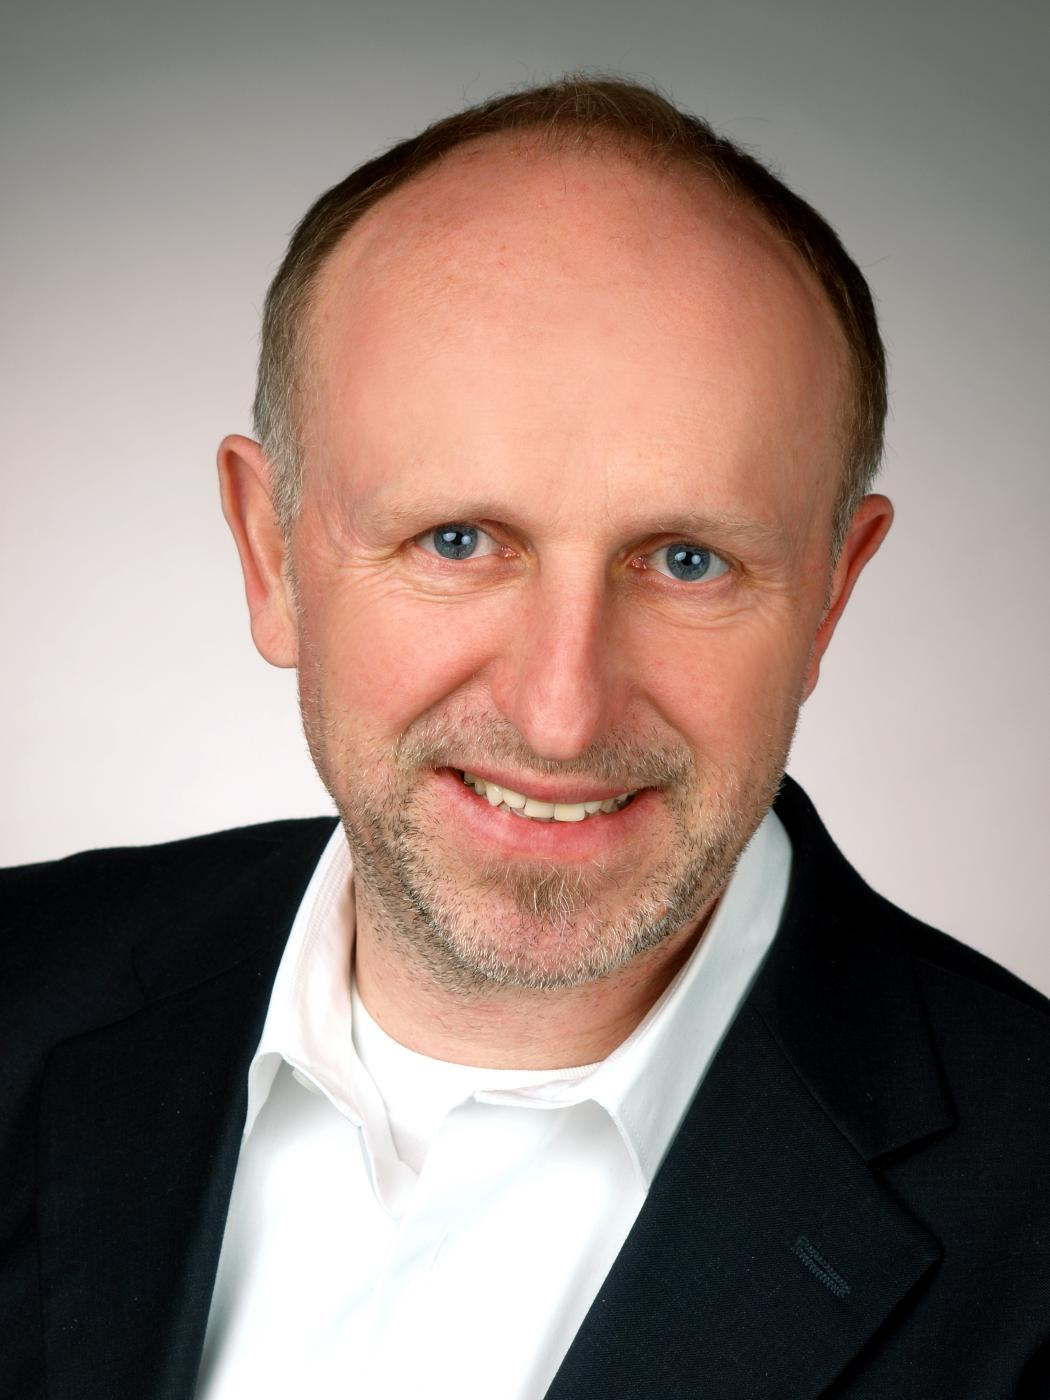 Wolfgang Mueller, Universität Paderborn, DE